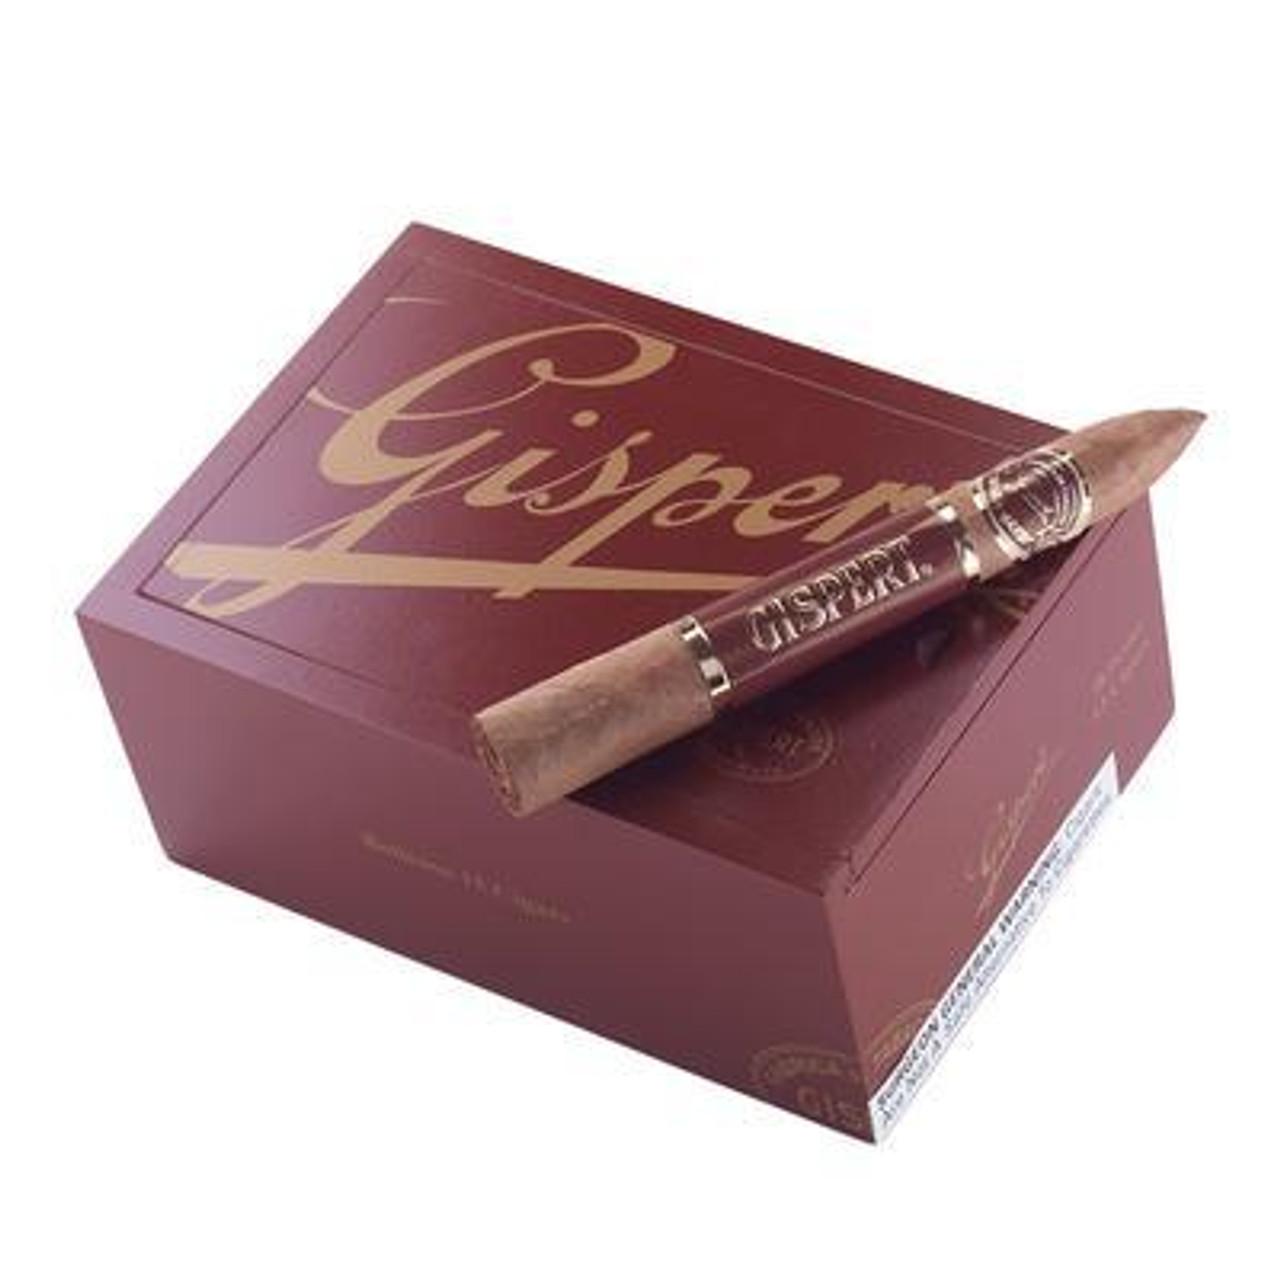 Gispert Belicoso Natural Cigars - 6.12 x 52 (Box of 25)